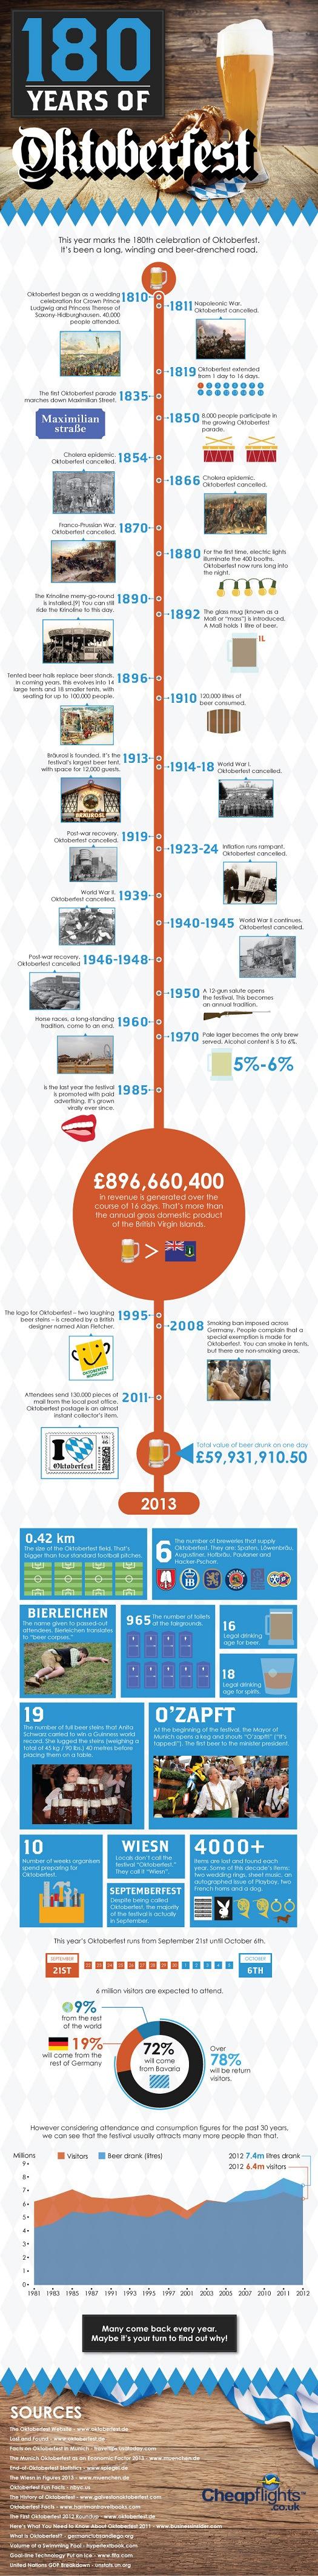 Oktoberfest History-Infographic